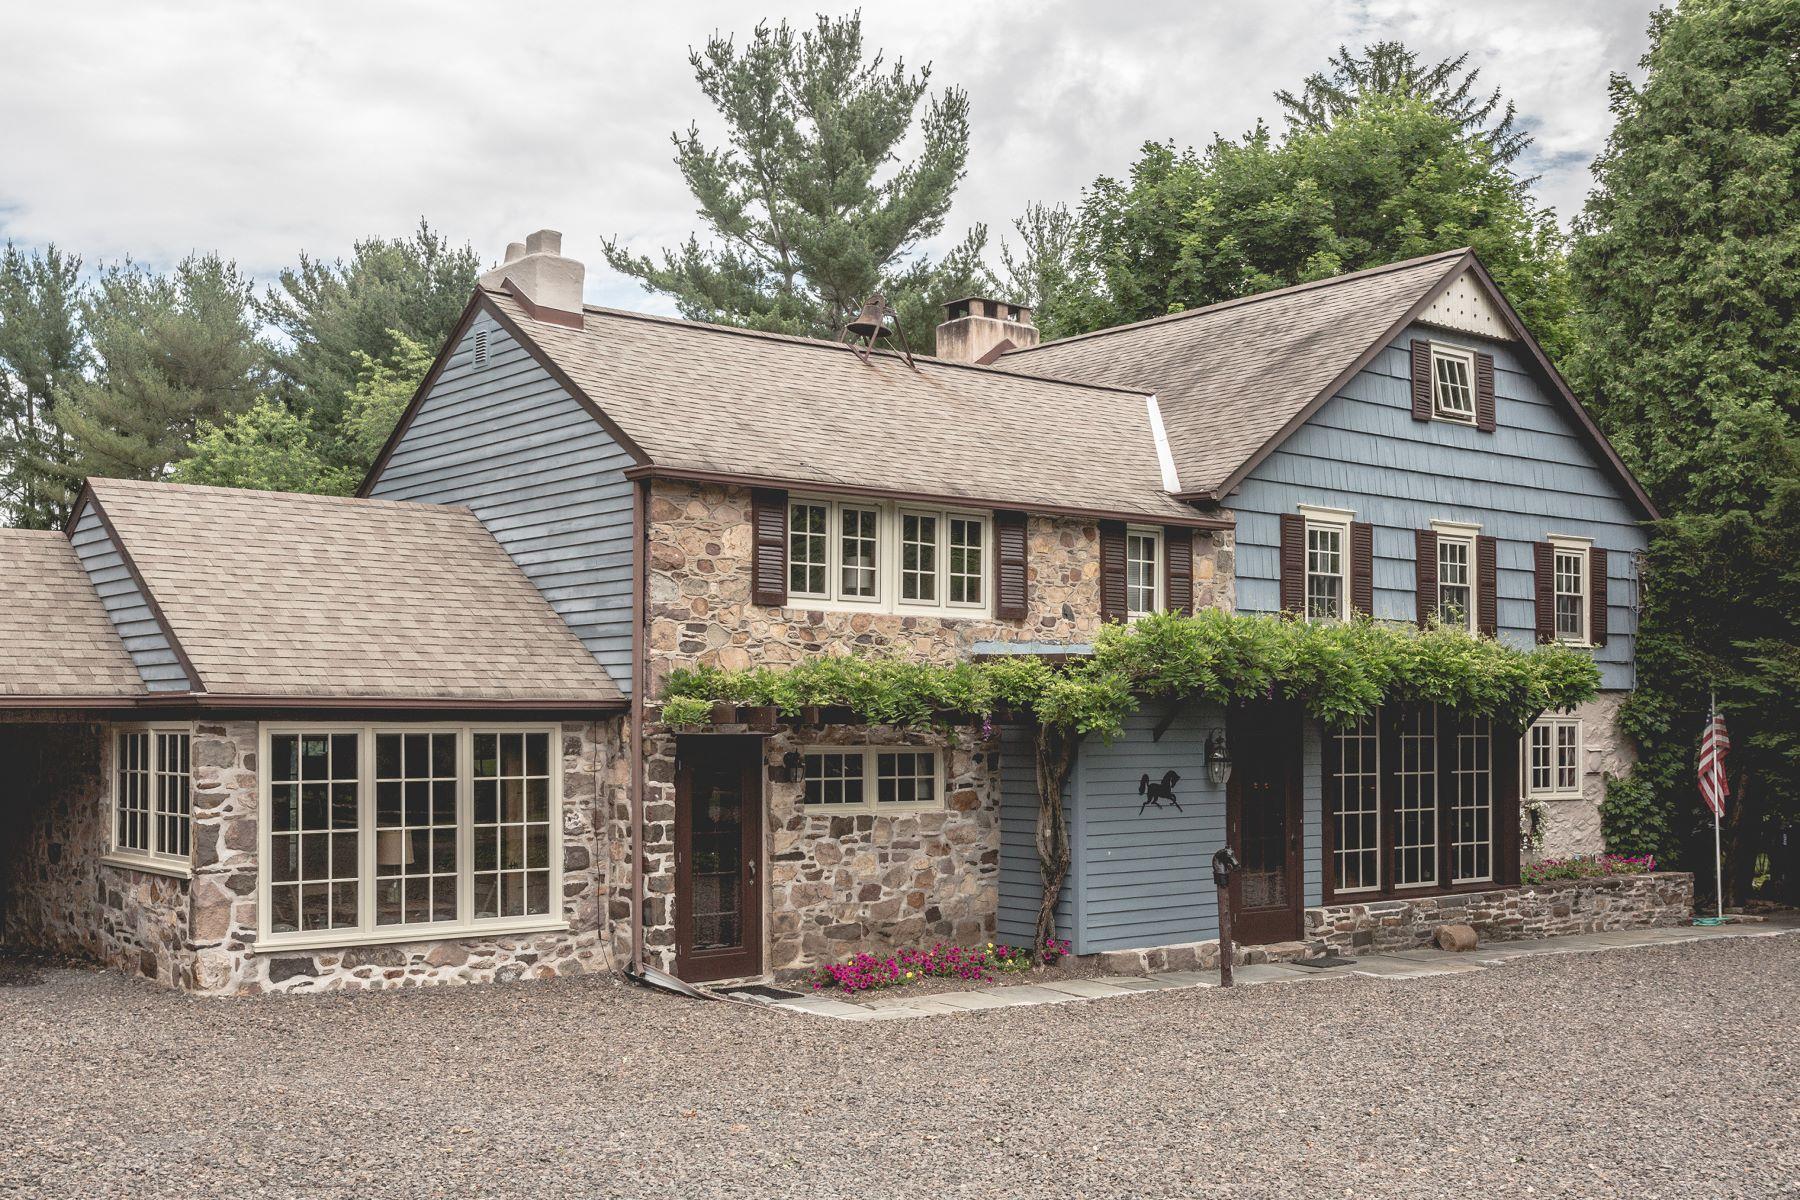 Moradia para Venda às 1588 Woodside Rd Yardley, Pensilvânia 19067 Estados Unidos